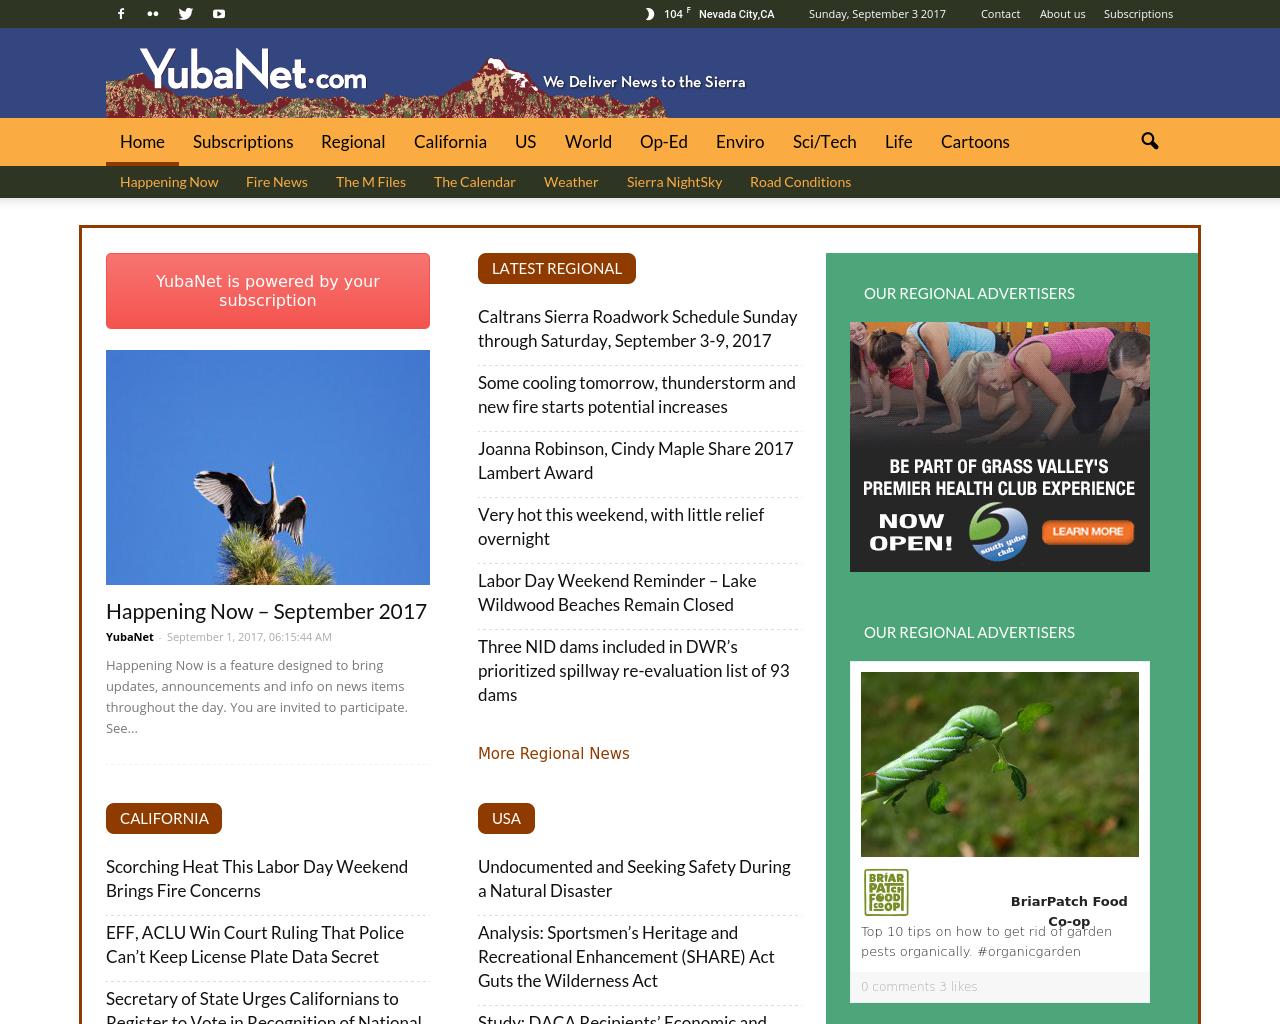 YubaNet-Advertising-Reviews-Pricing